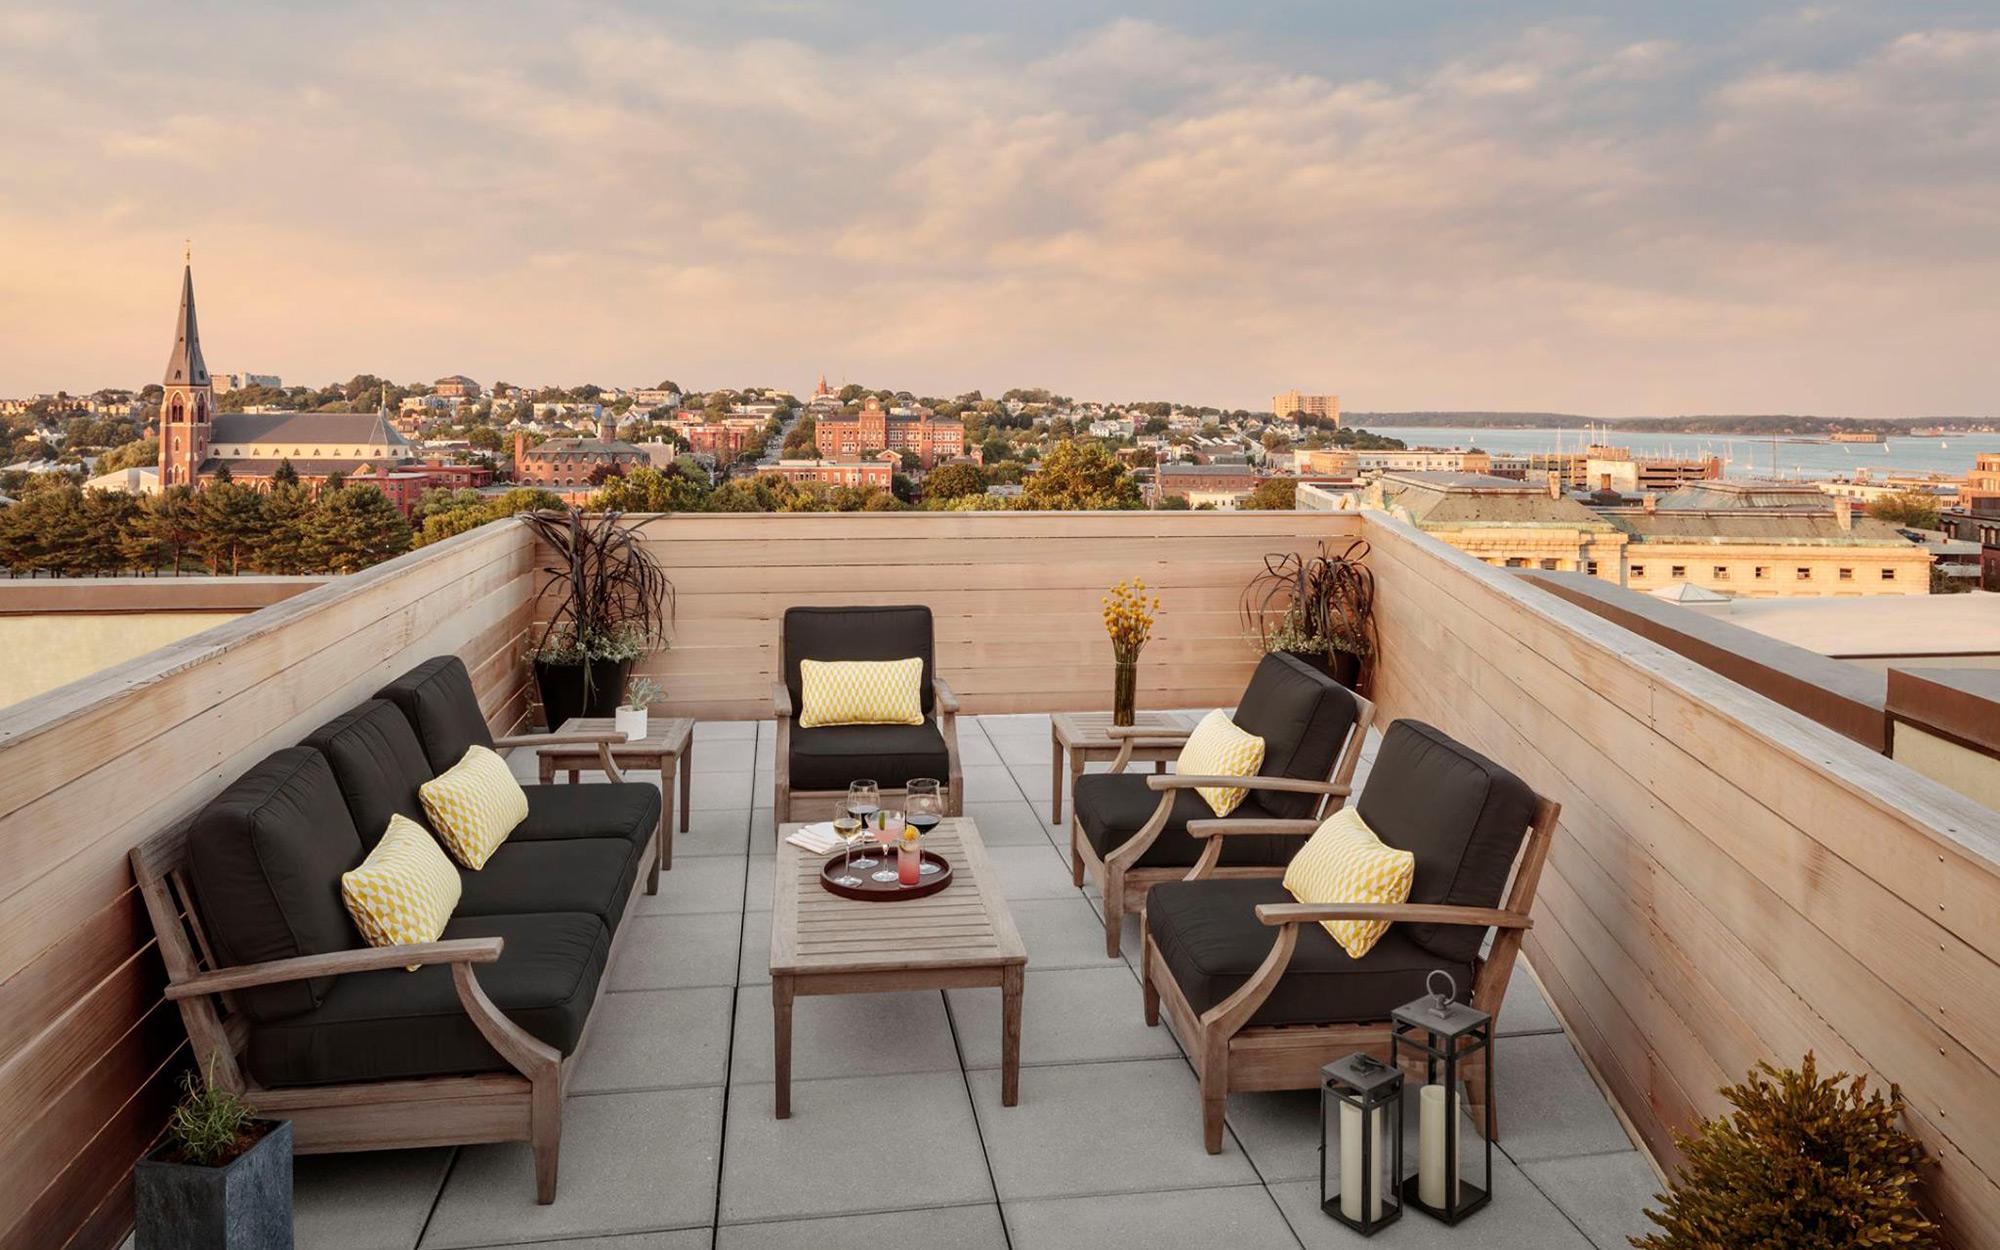 Coolest New Urban Hotels: Press Hotel, Portland, Maine